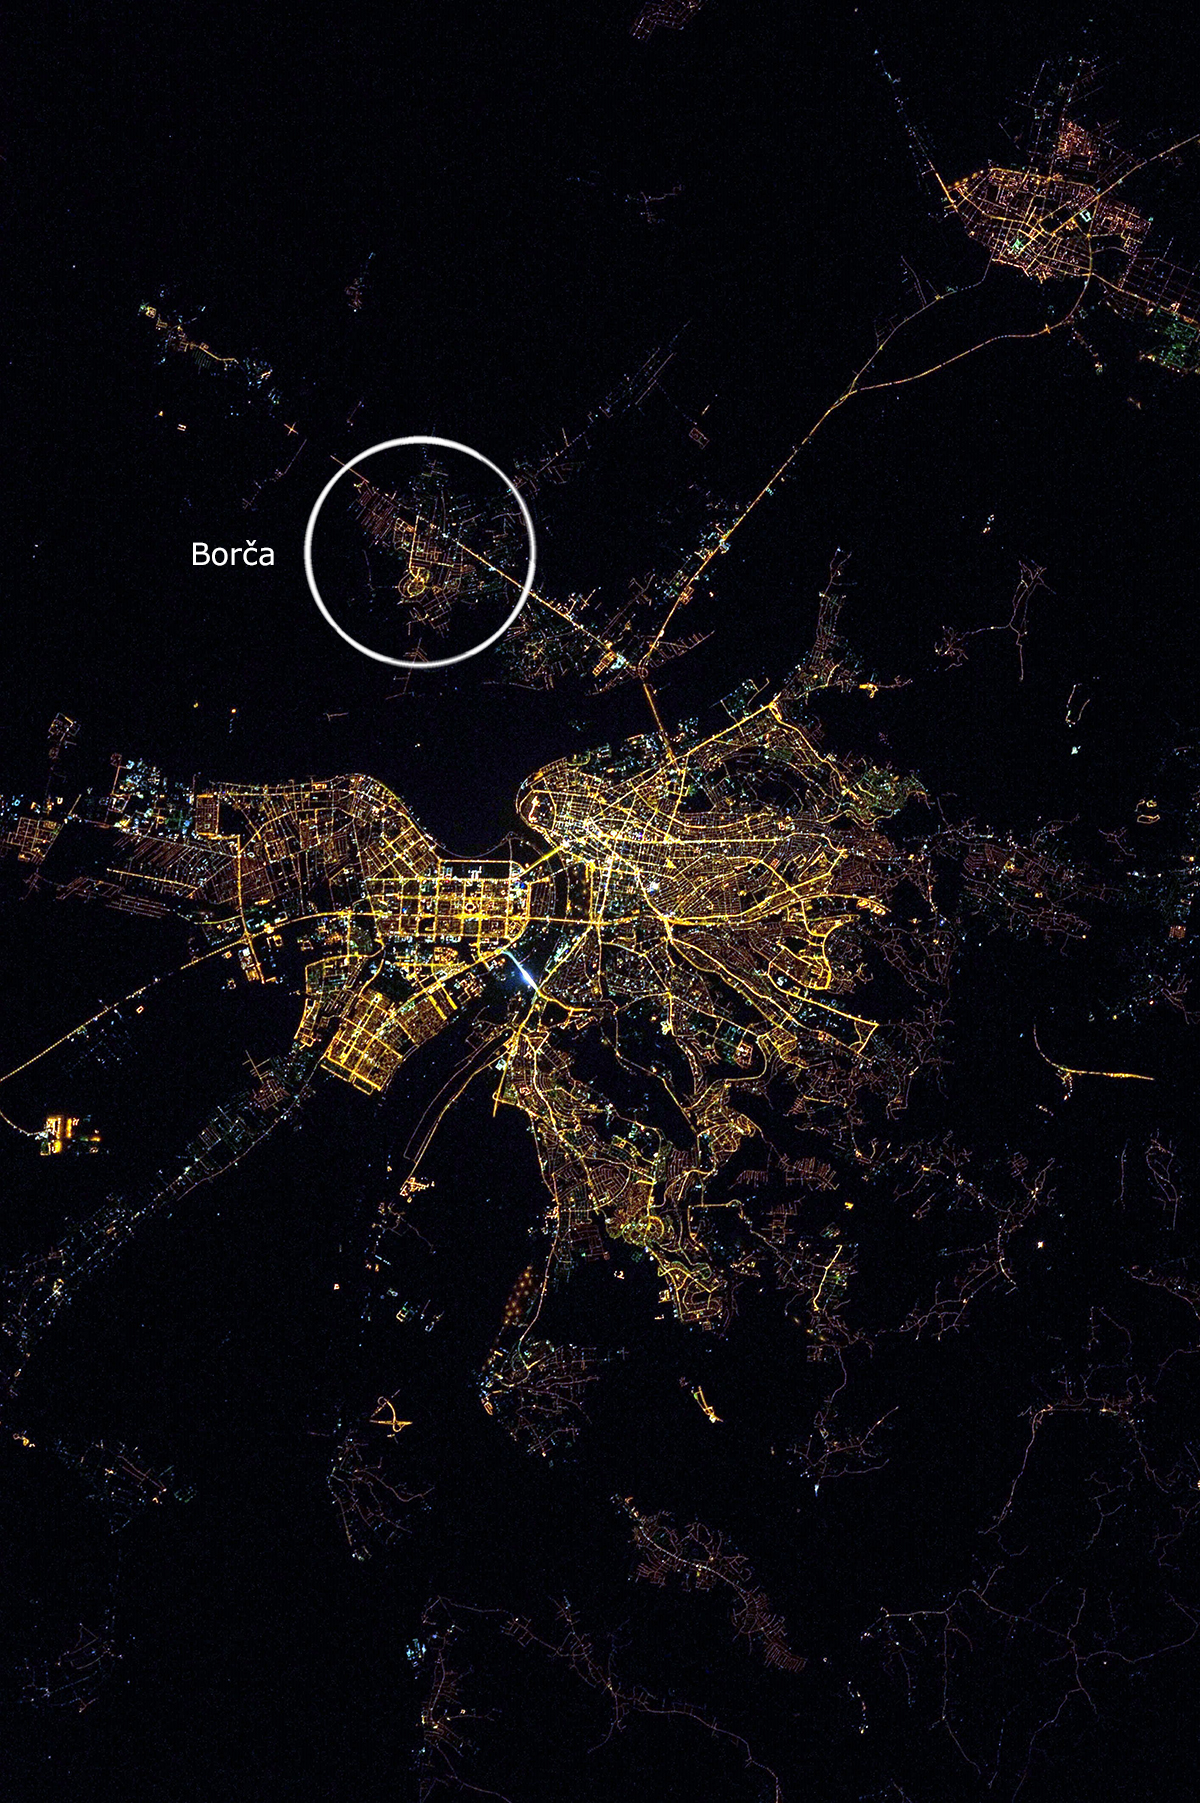 mapa borce beograd Borča » treći Beograd, leva obala Dunava, mapa borce beograd